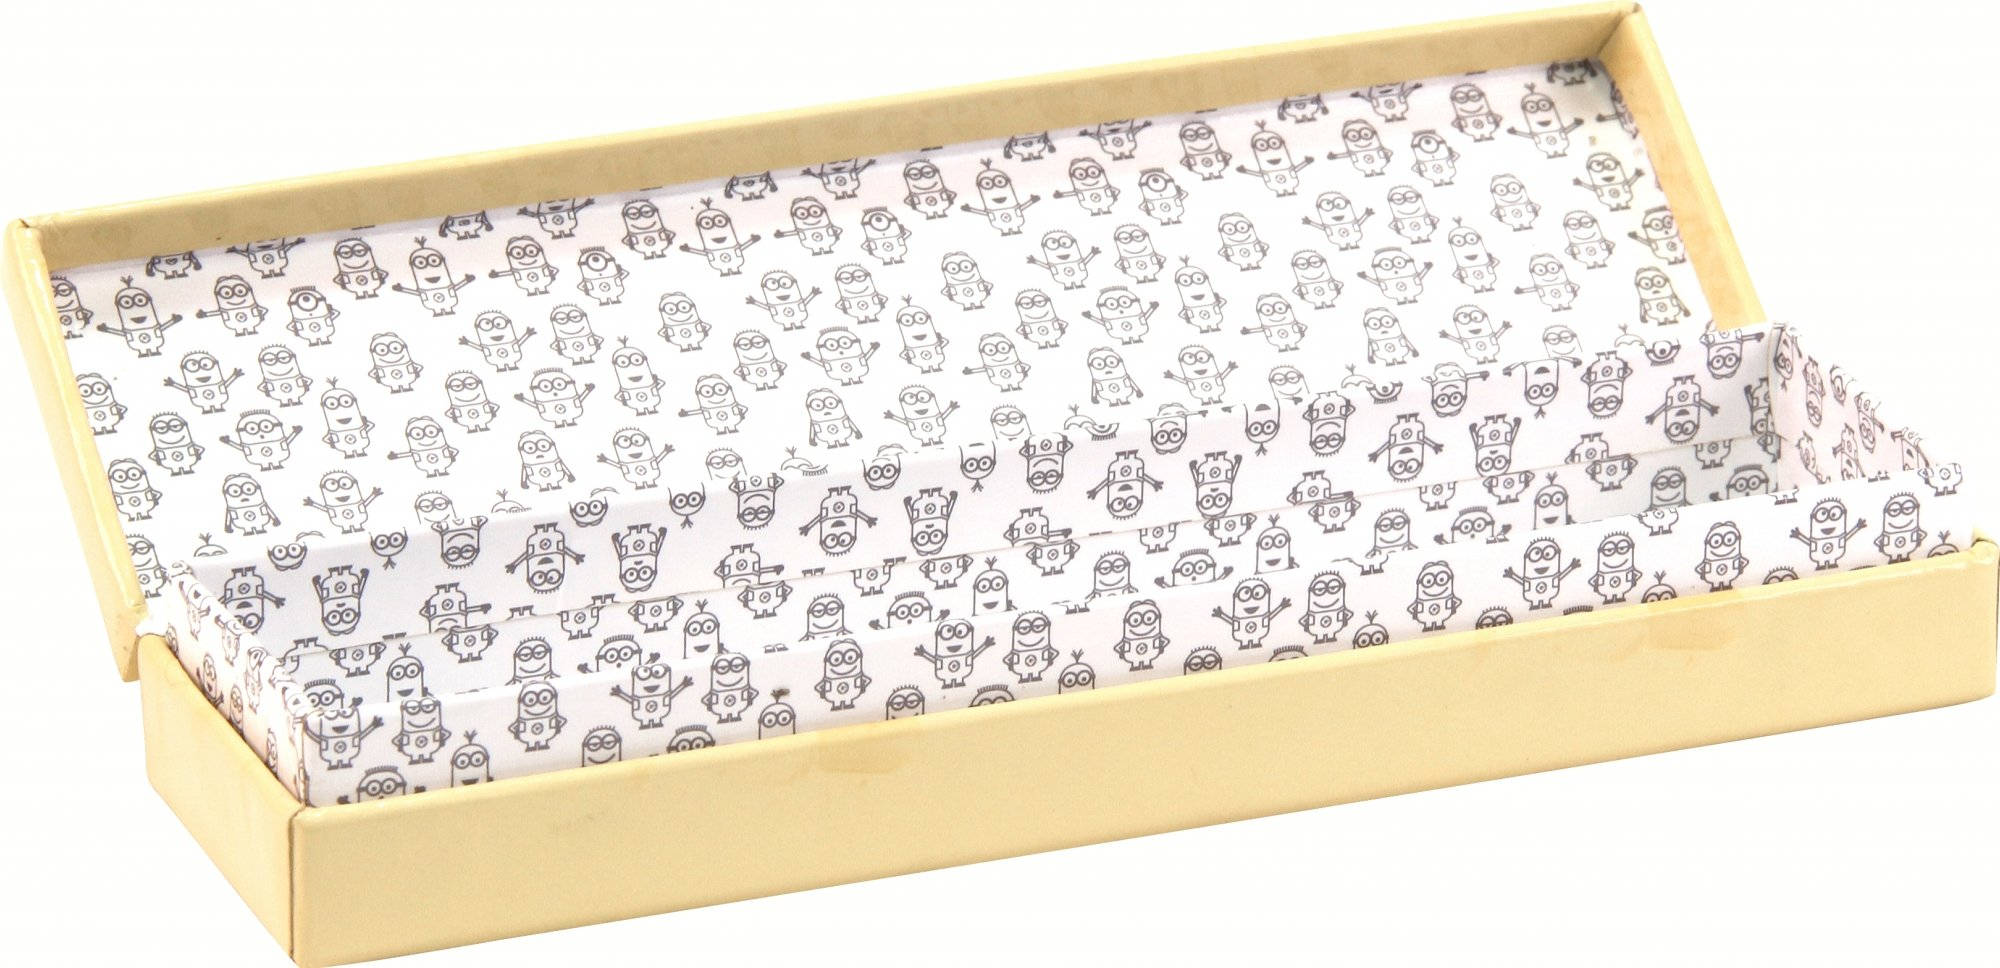 Clairefontaine 812742C–Plumier cartón Minions Dimensión, 21x 5,5x 3cm Bananas